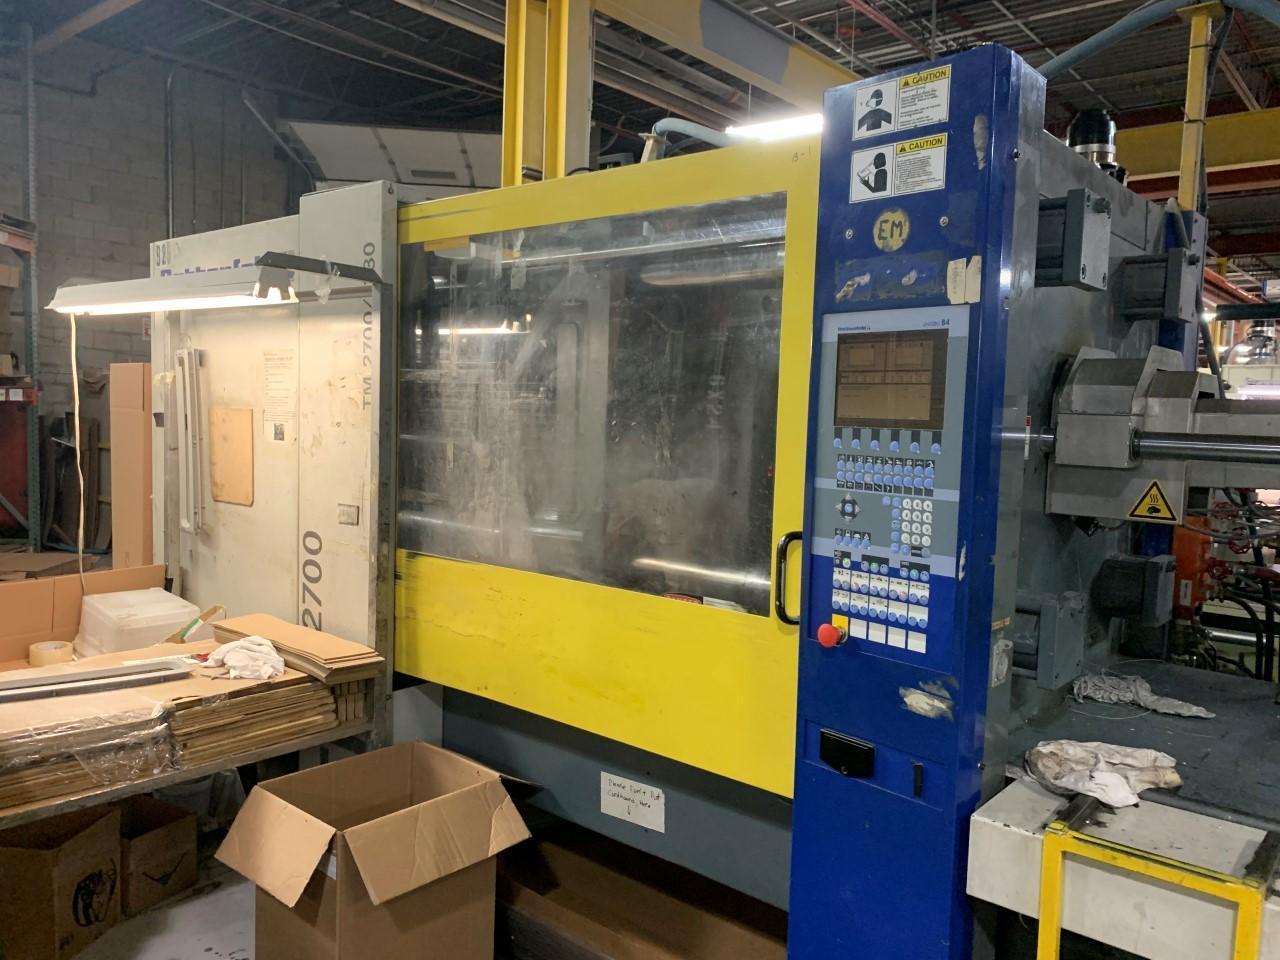 Battenfeld TM 2700-1330 Injection Molding Machine